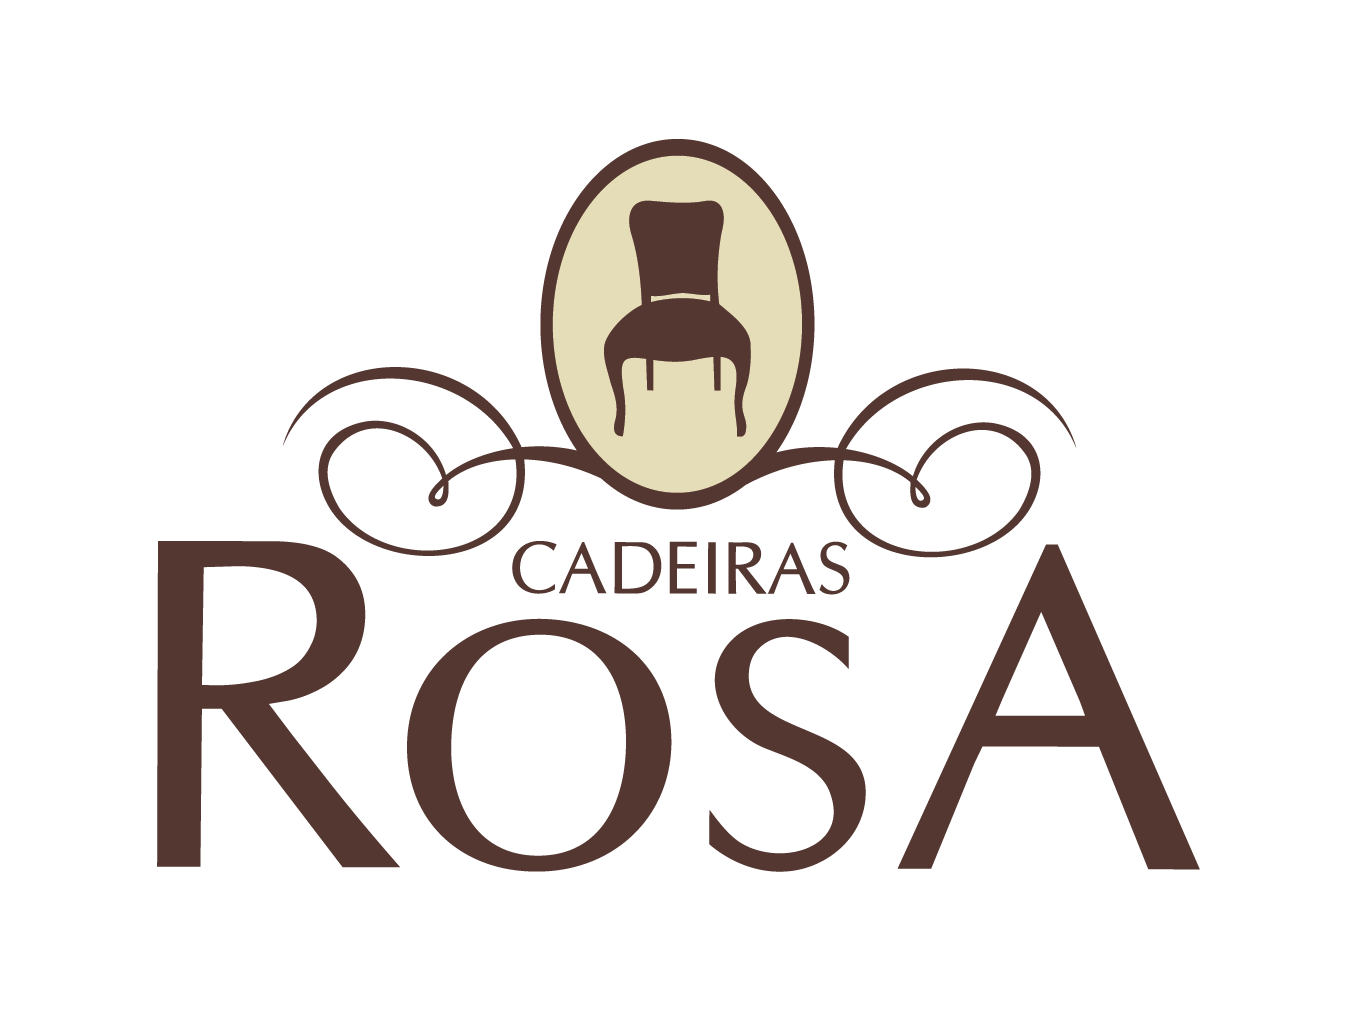 Cadeiras Rosa